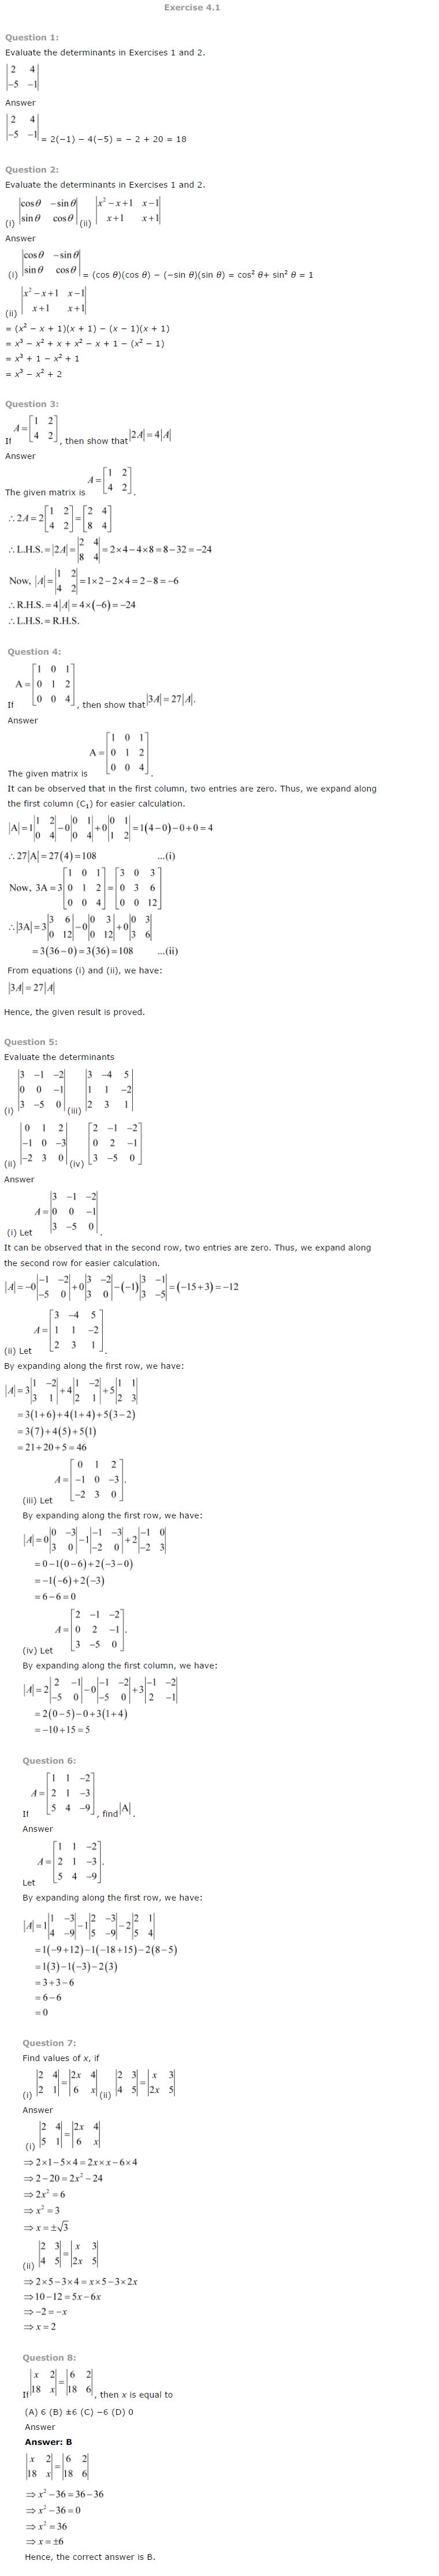 properties of determinants class 12 pdf